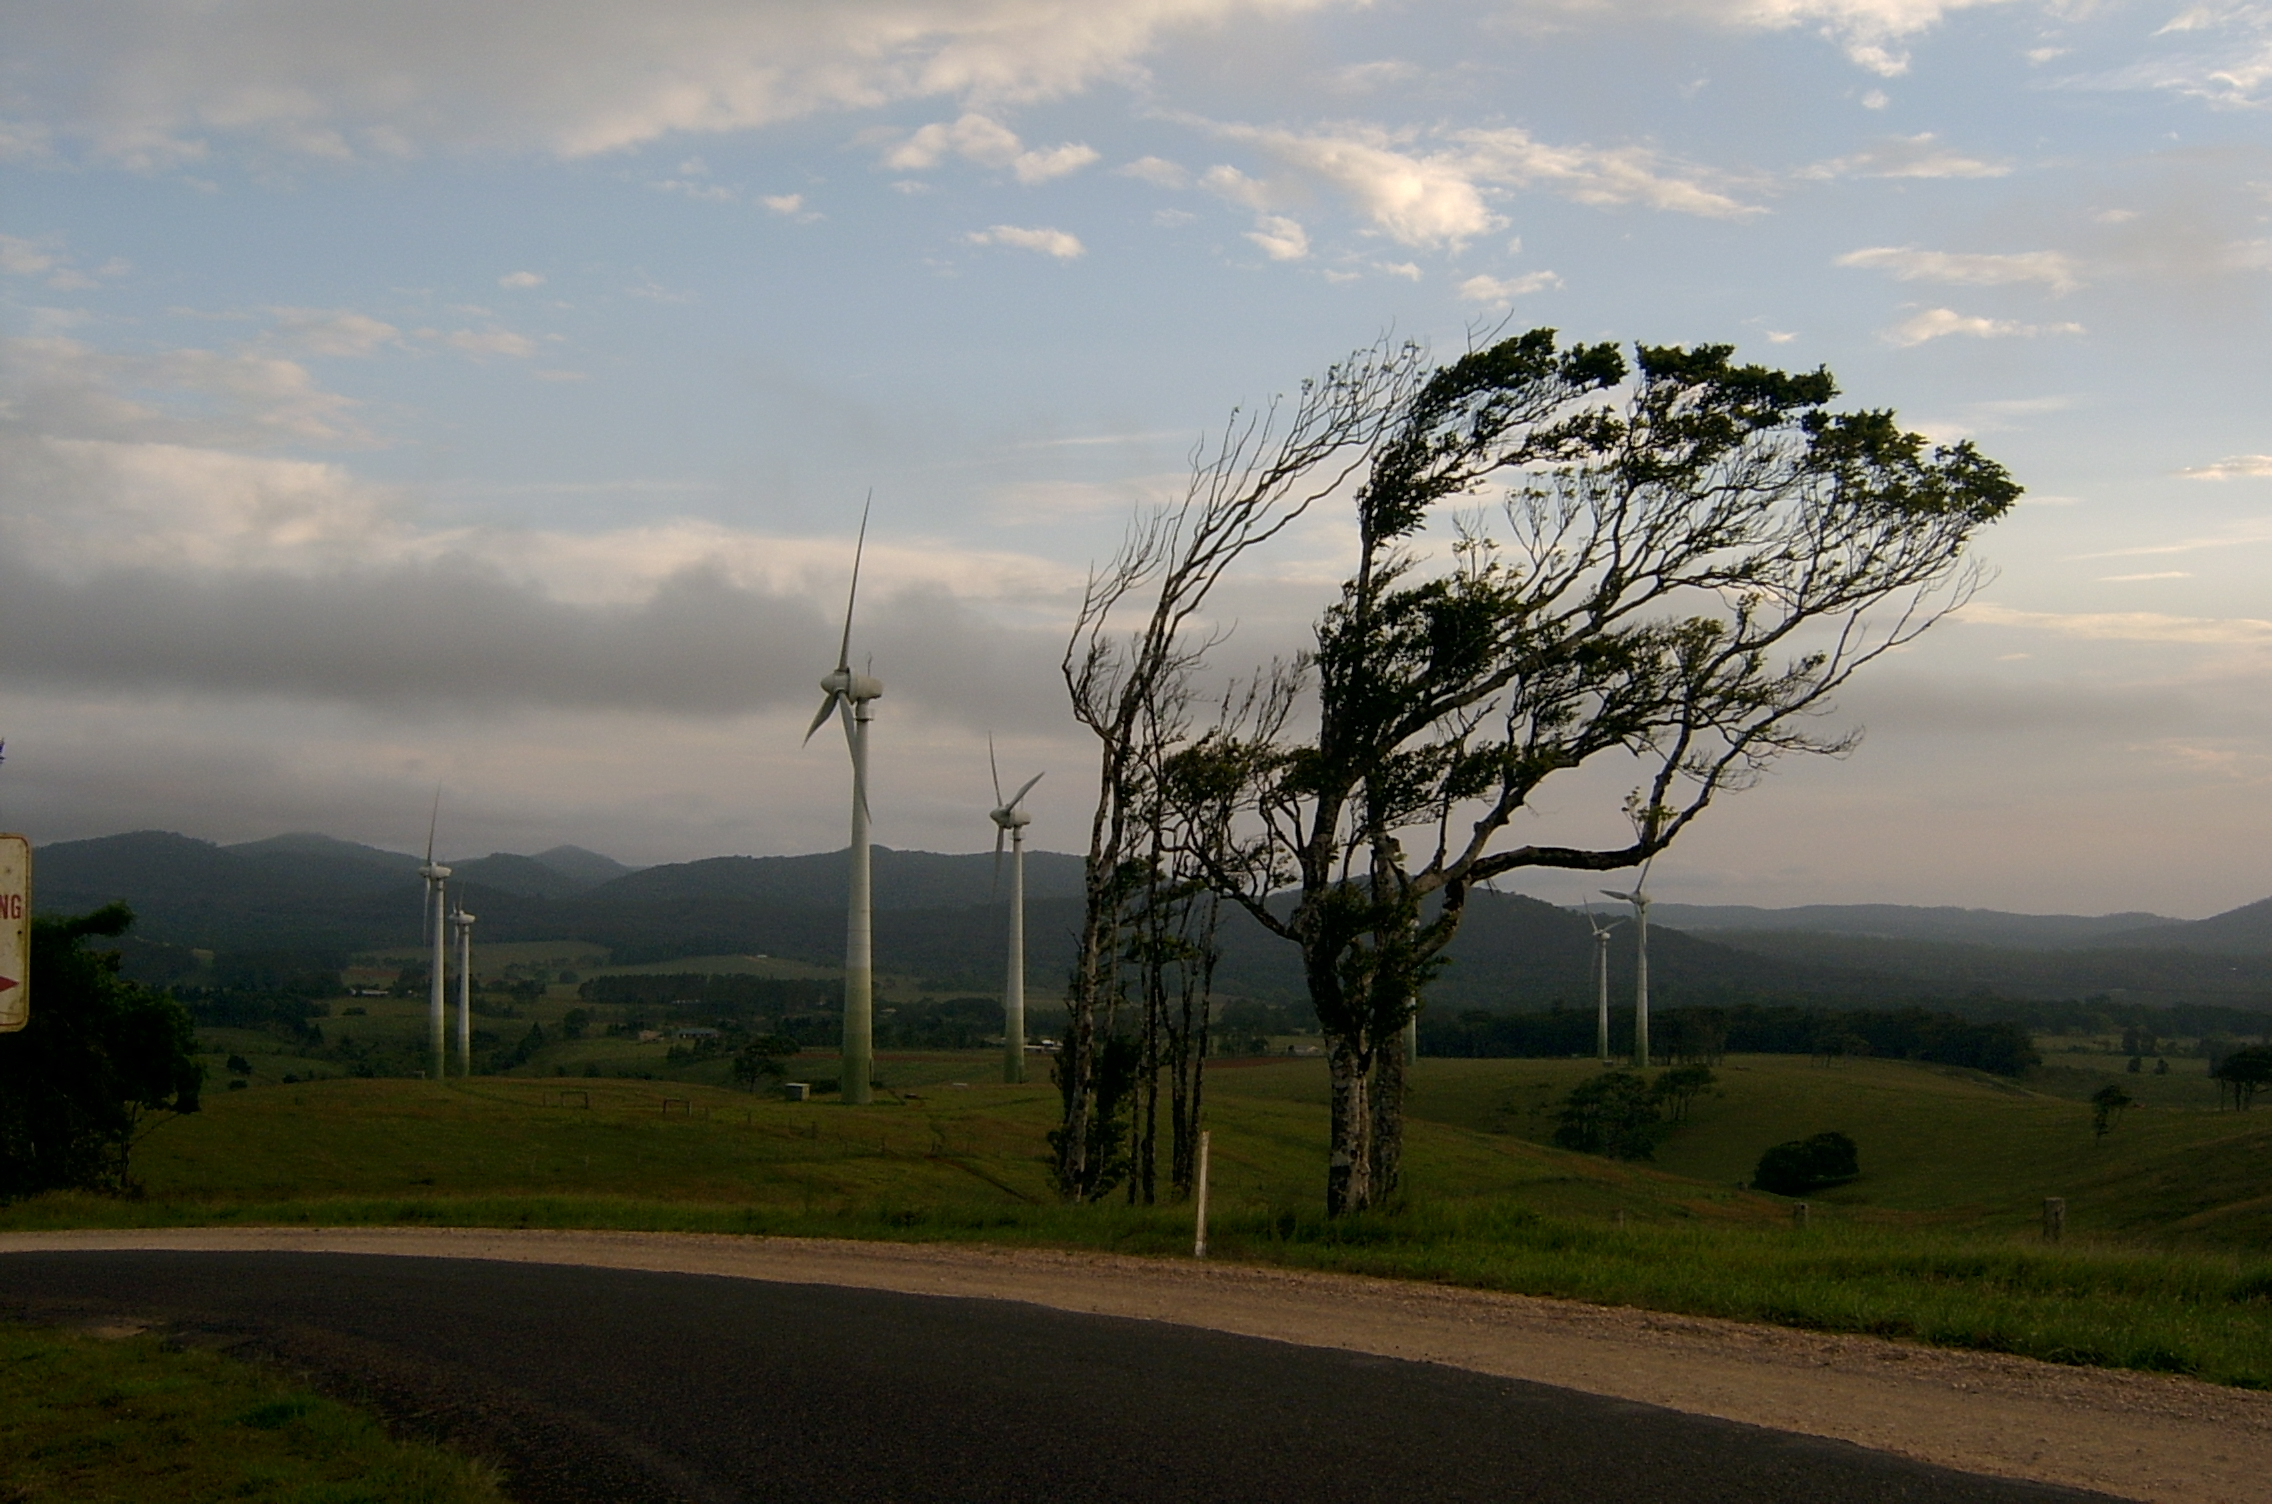 Windy salary